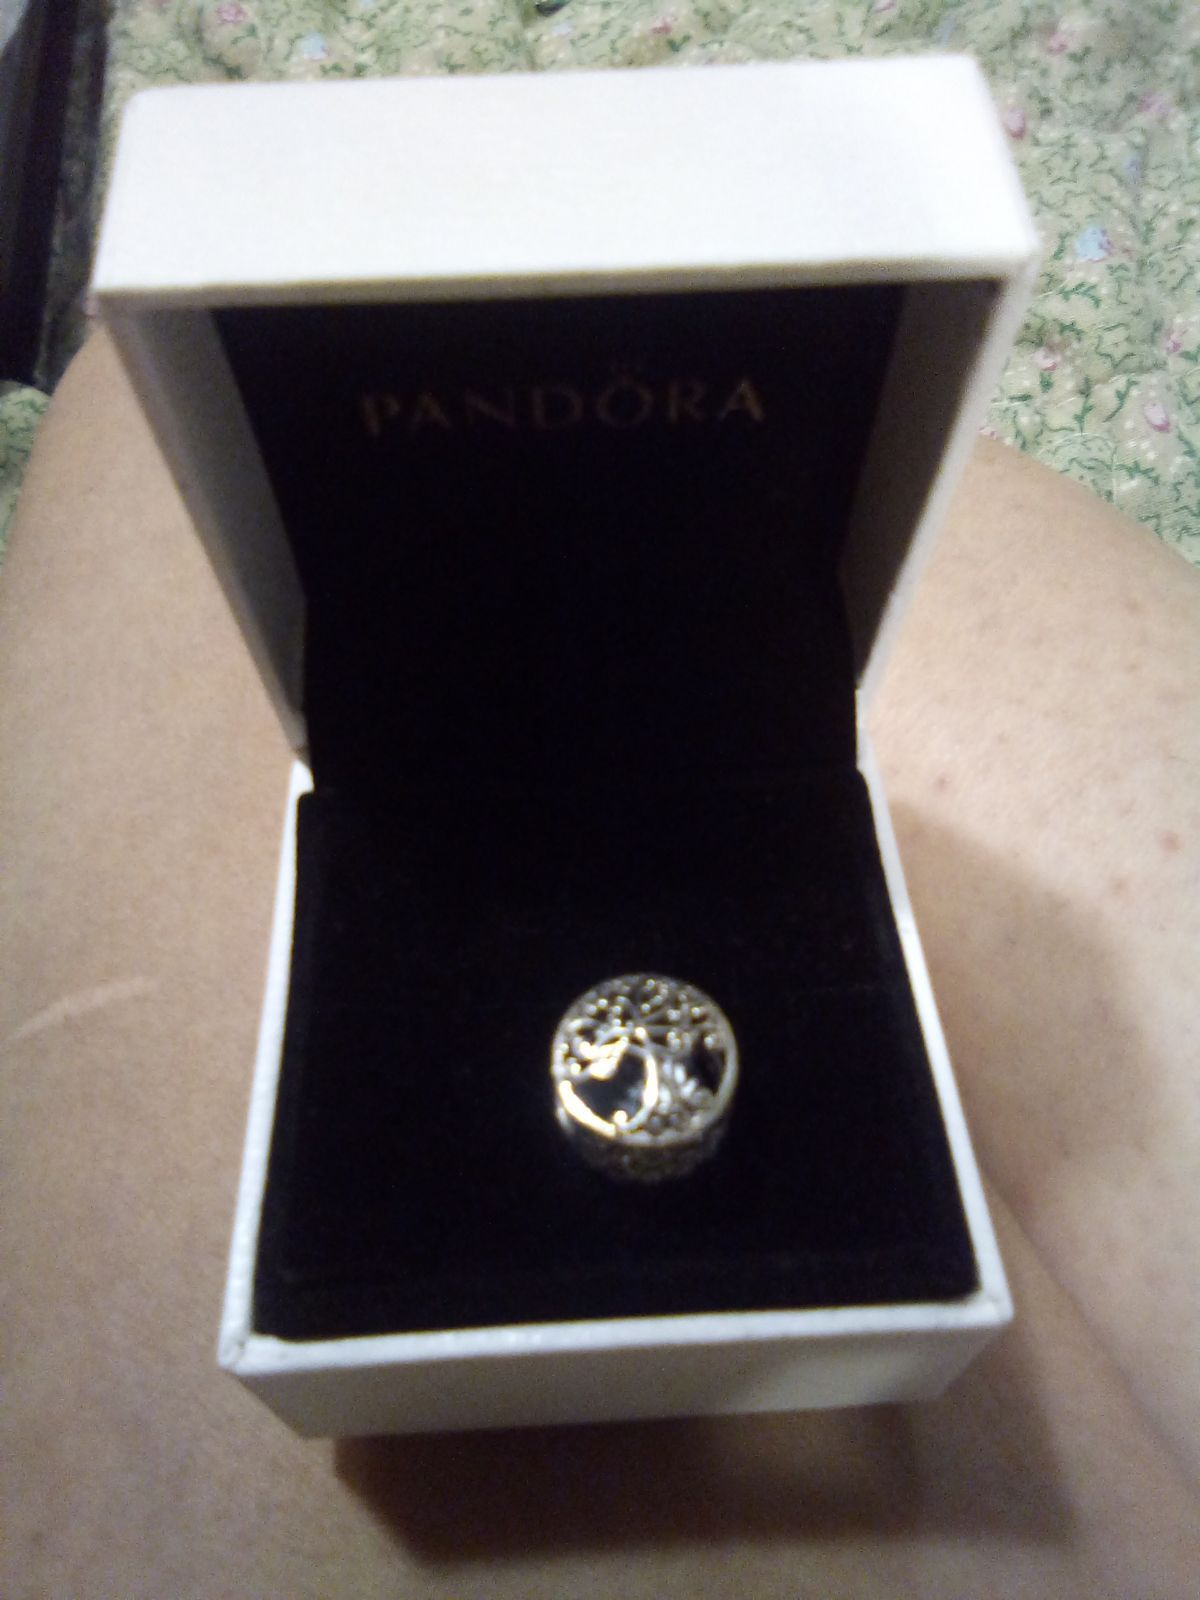 Tree Of Life Pandora Charm Back Say Family Is Where Love Grows Stamped Brand New Pandora Charms Pandora Charmed